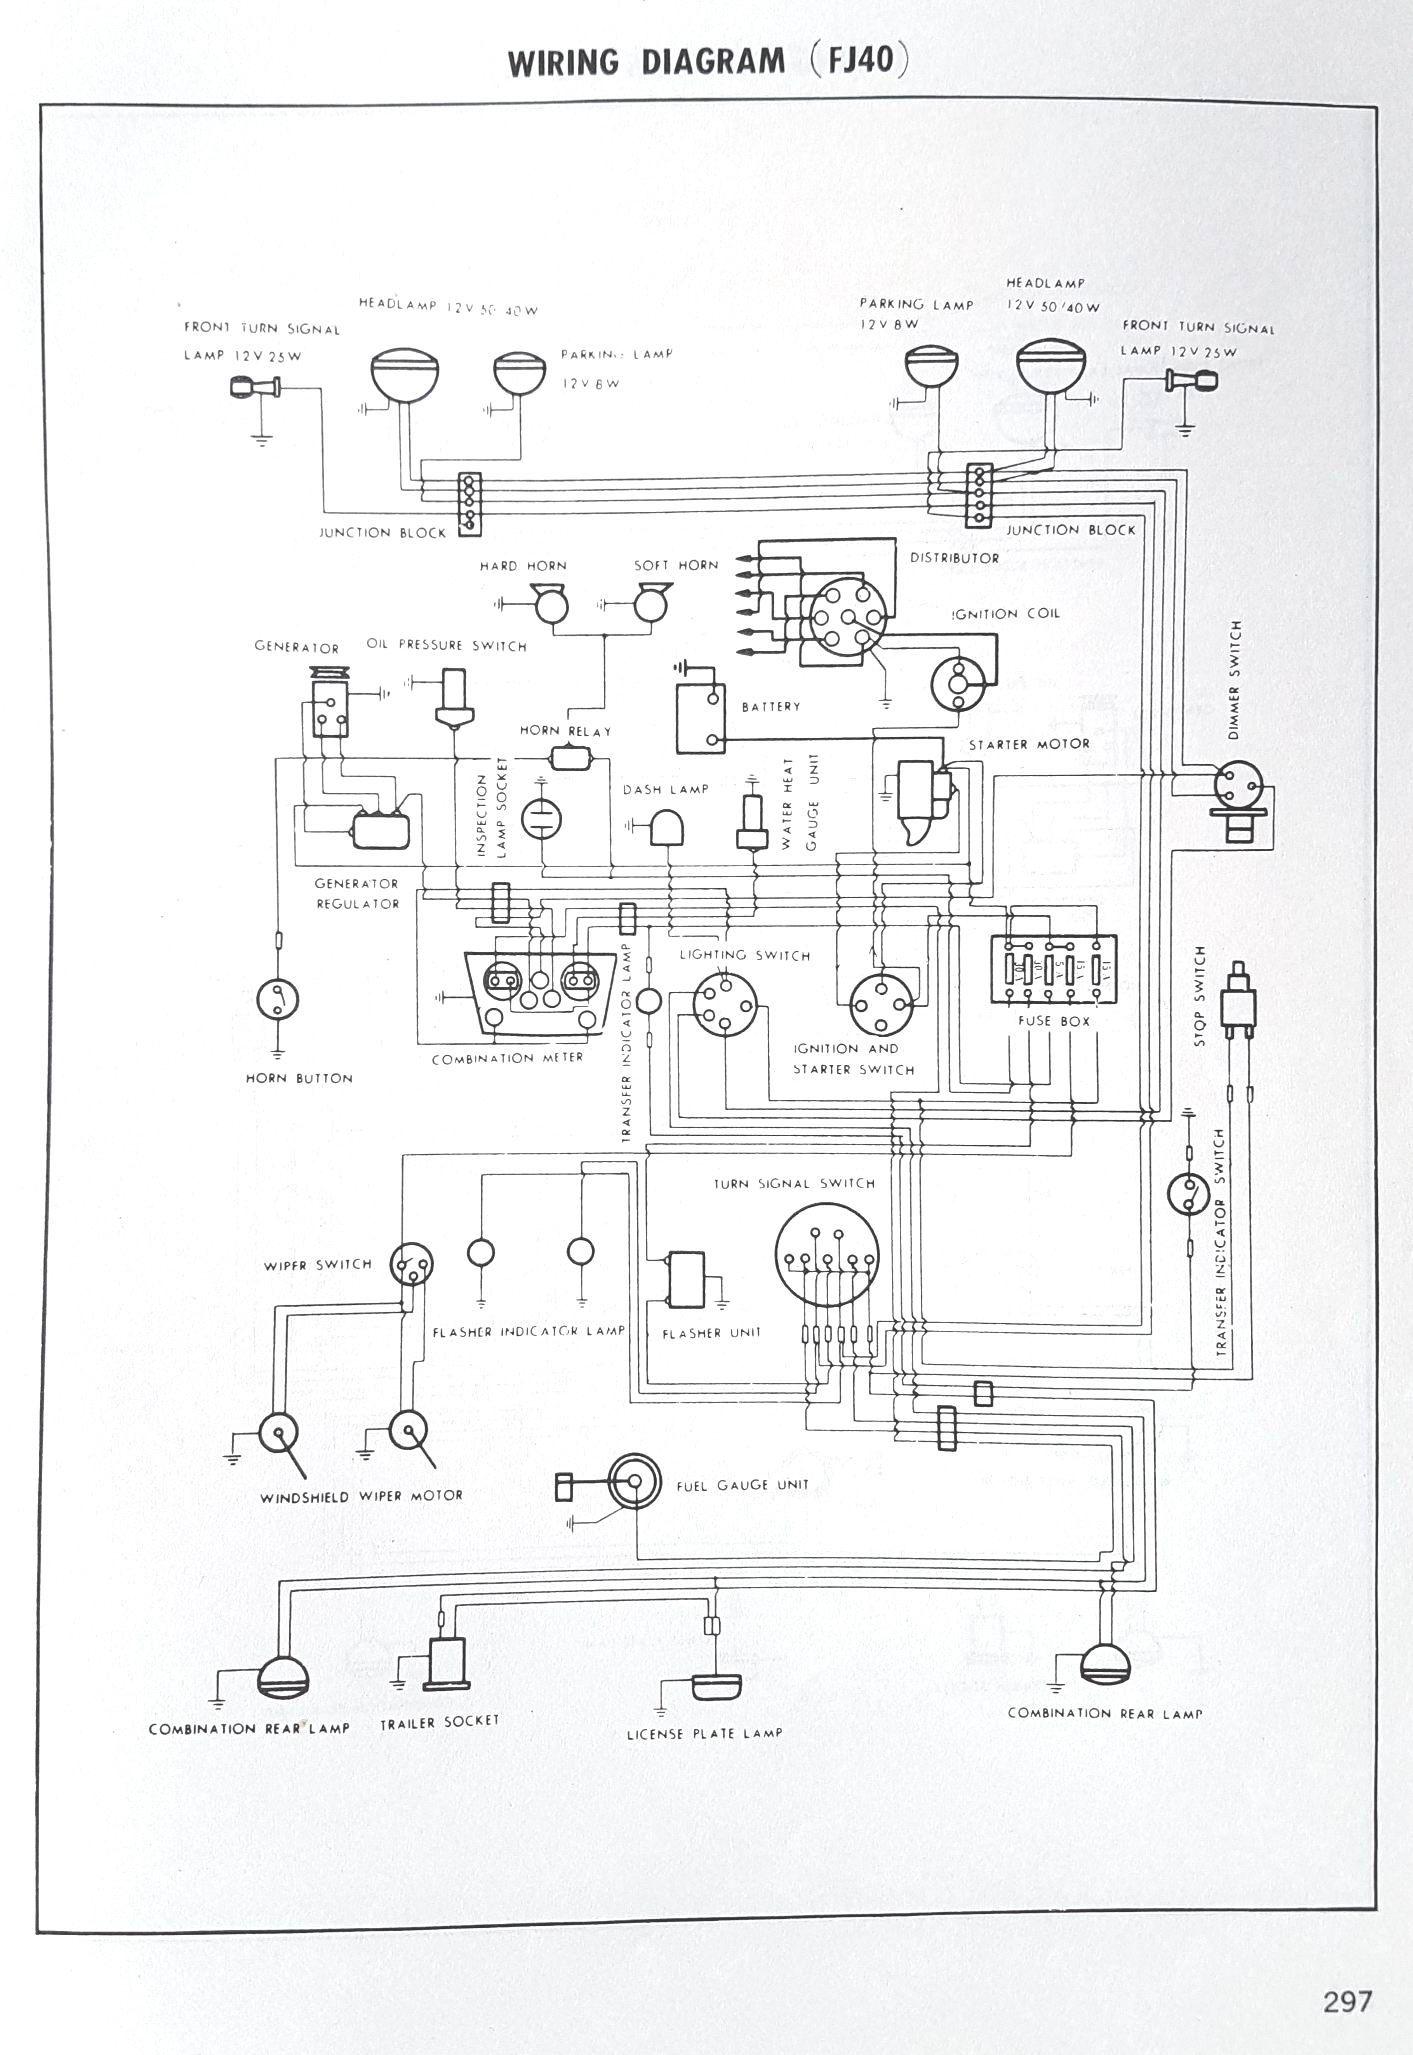 Fj45 Wiring Diagram